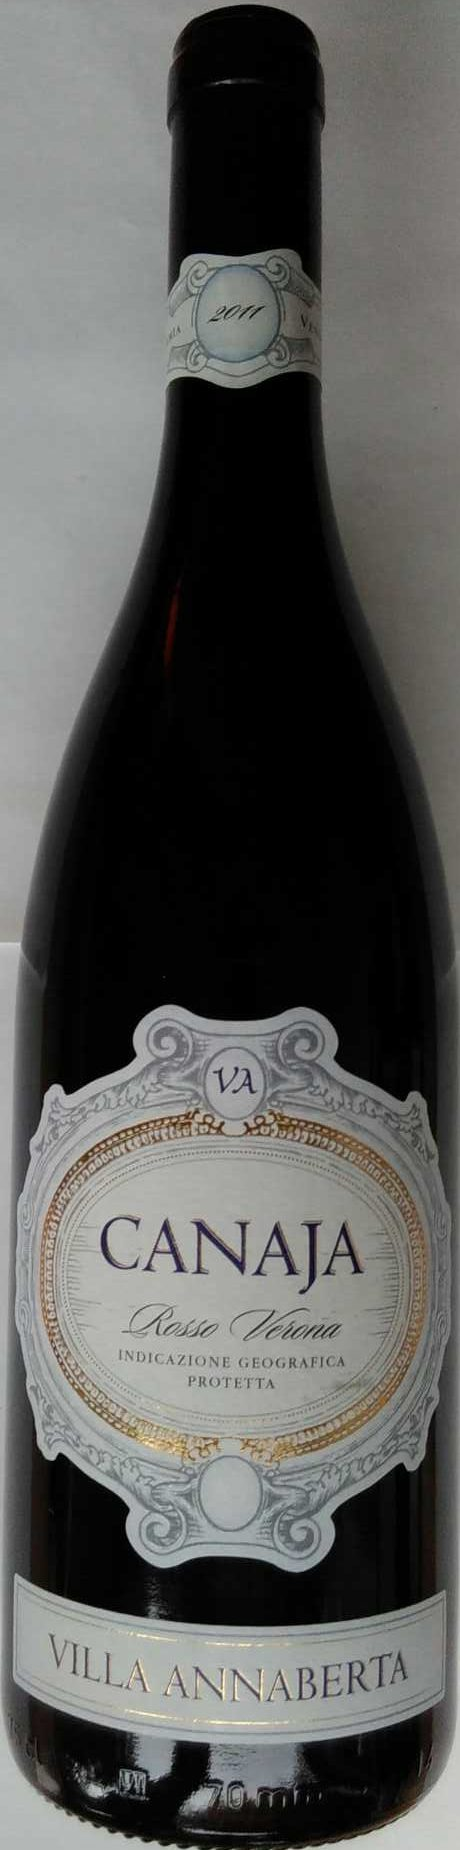 Canaja Rosso Veronese - Product - de